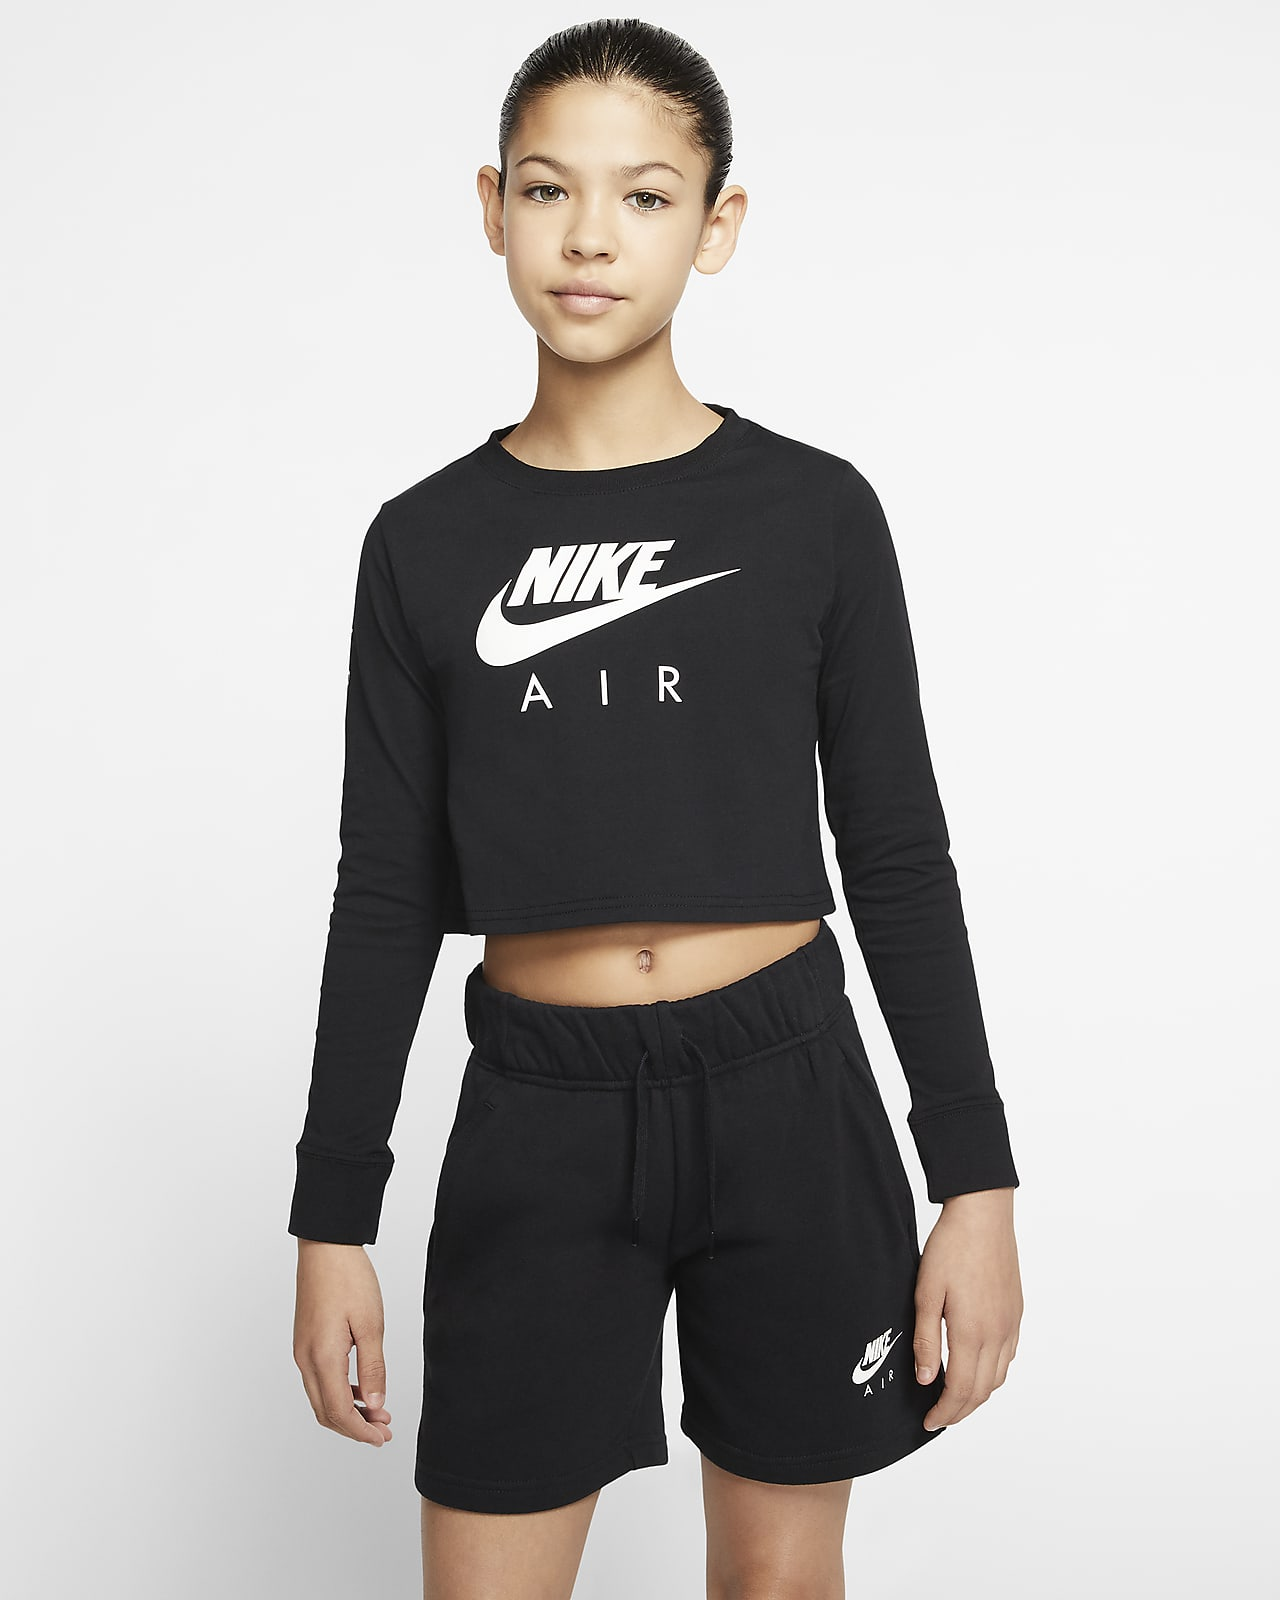 Nike Air Older Kids' (Girls') Long-Sleeve T-Shirt